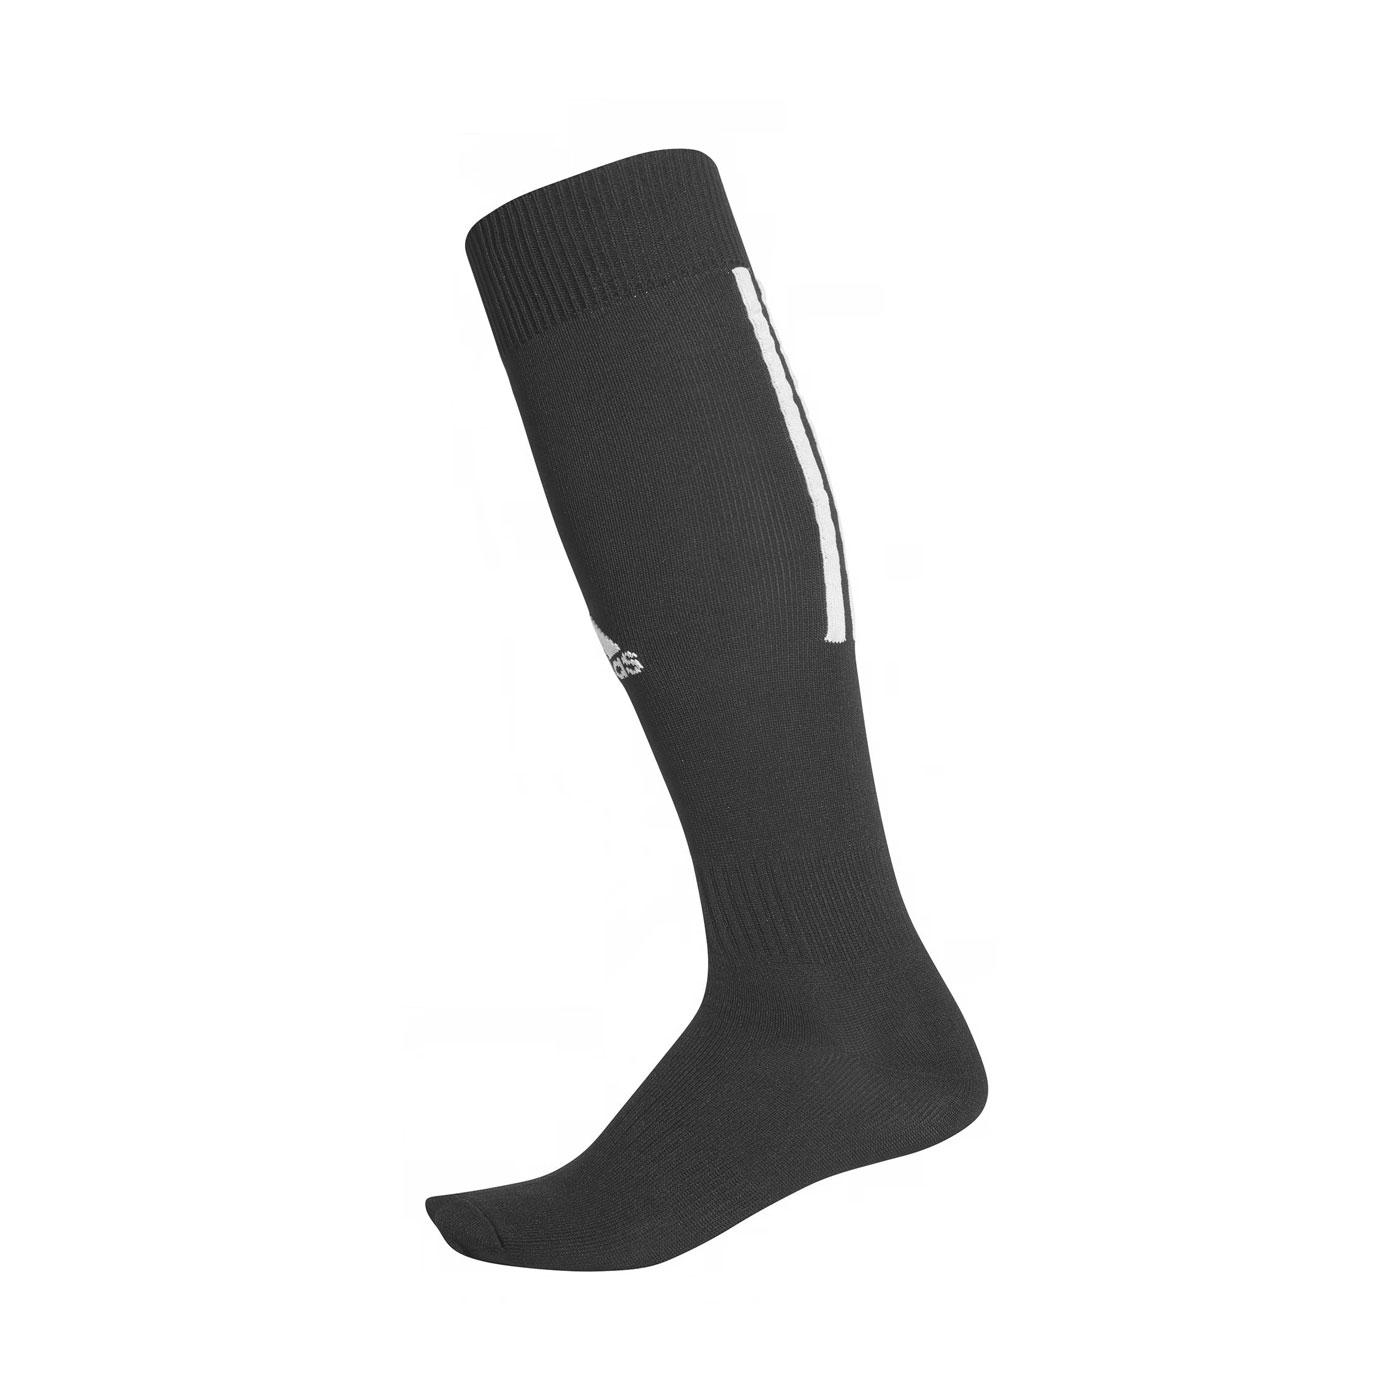 ADIDAS 襪子 CV3588